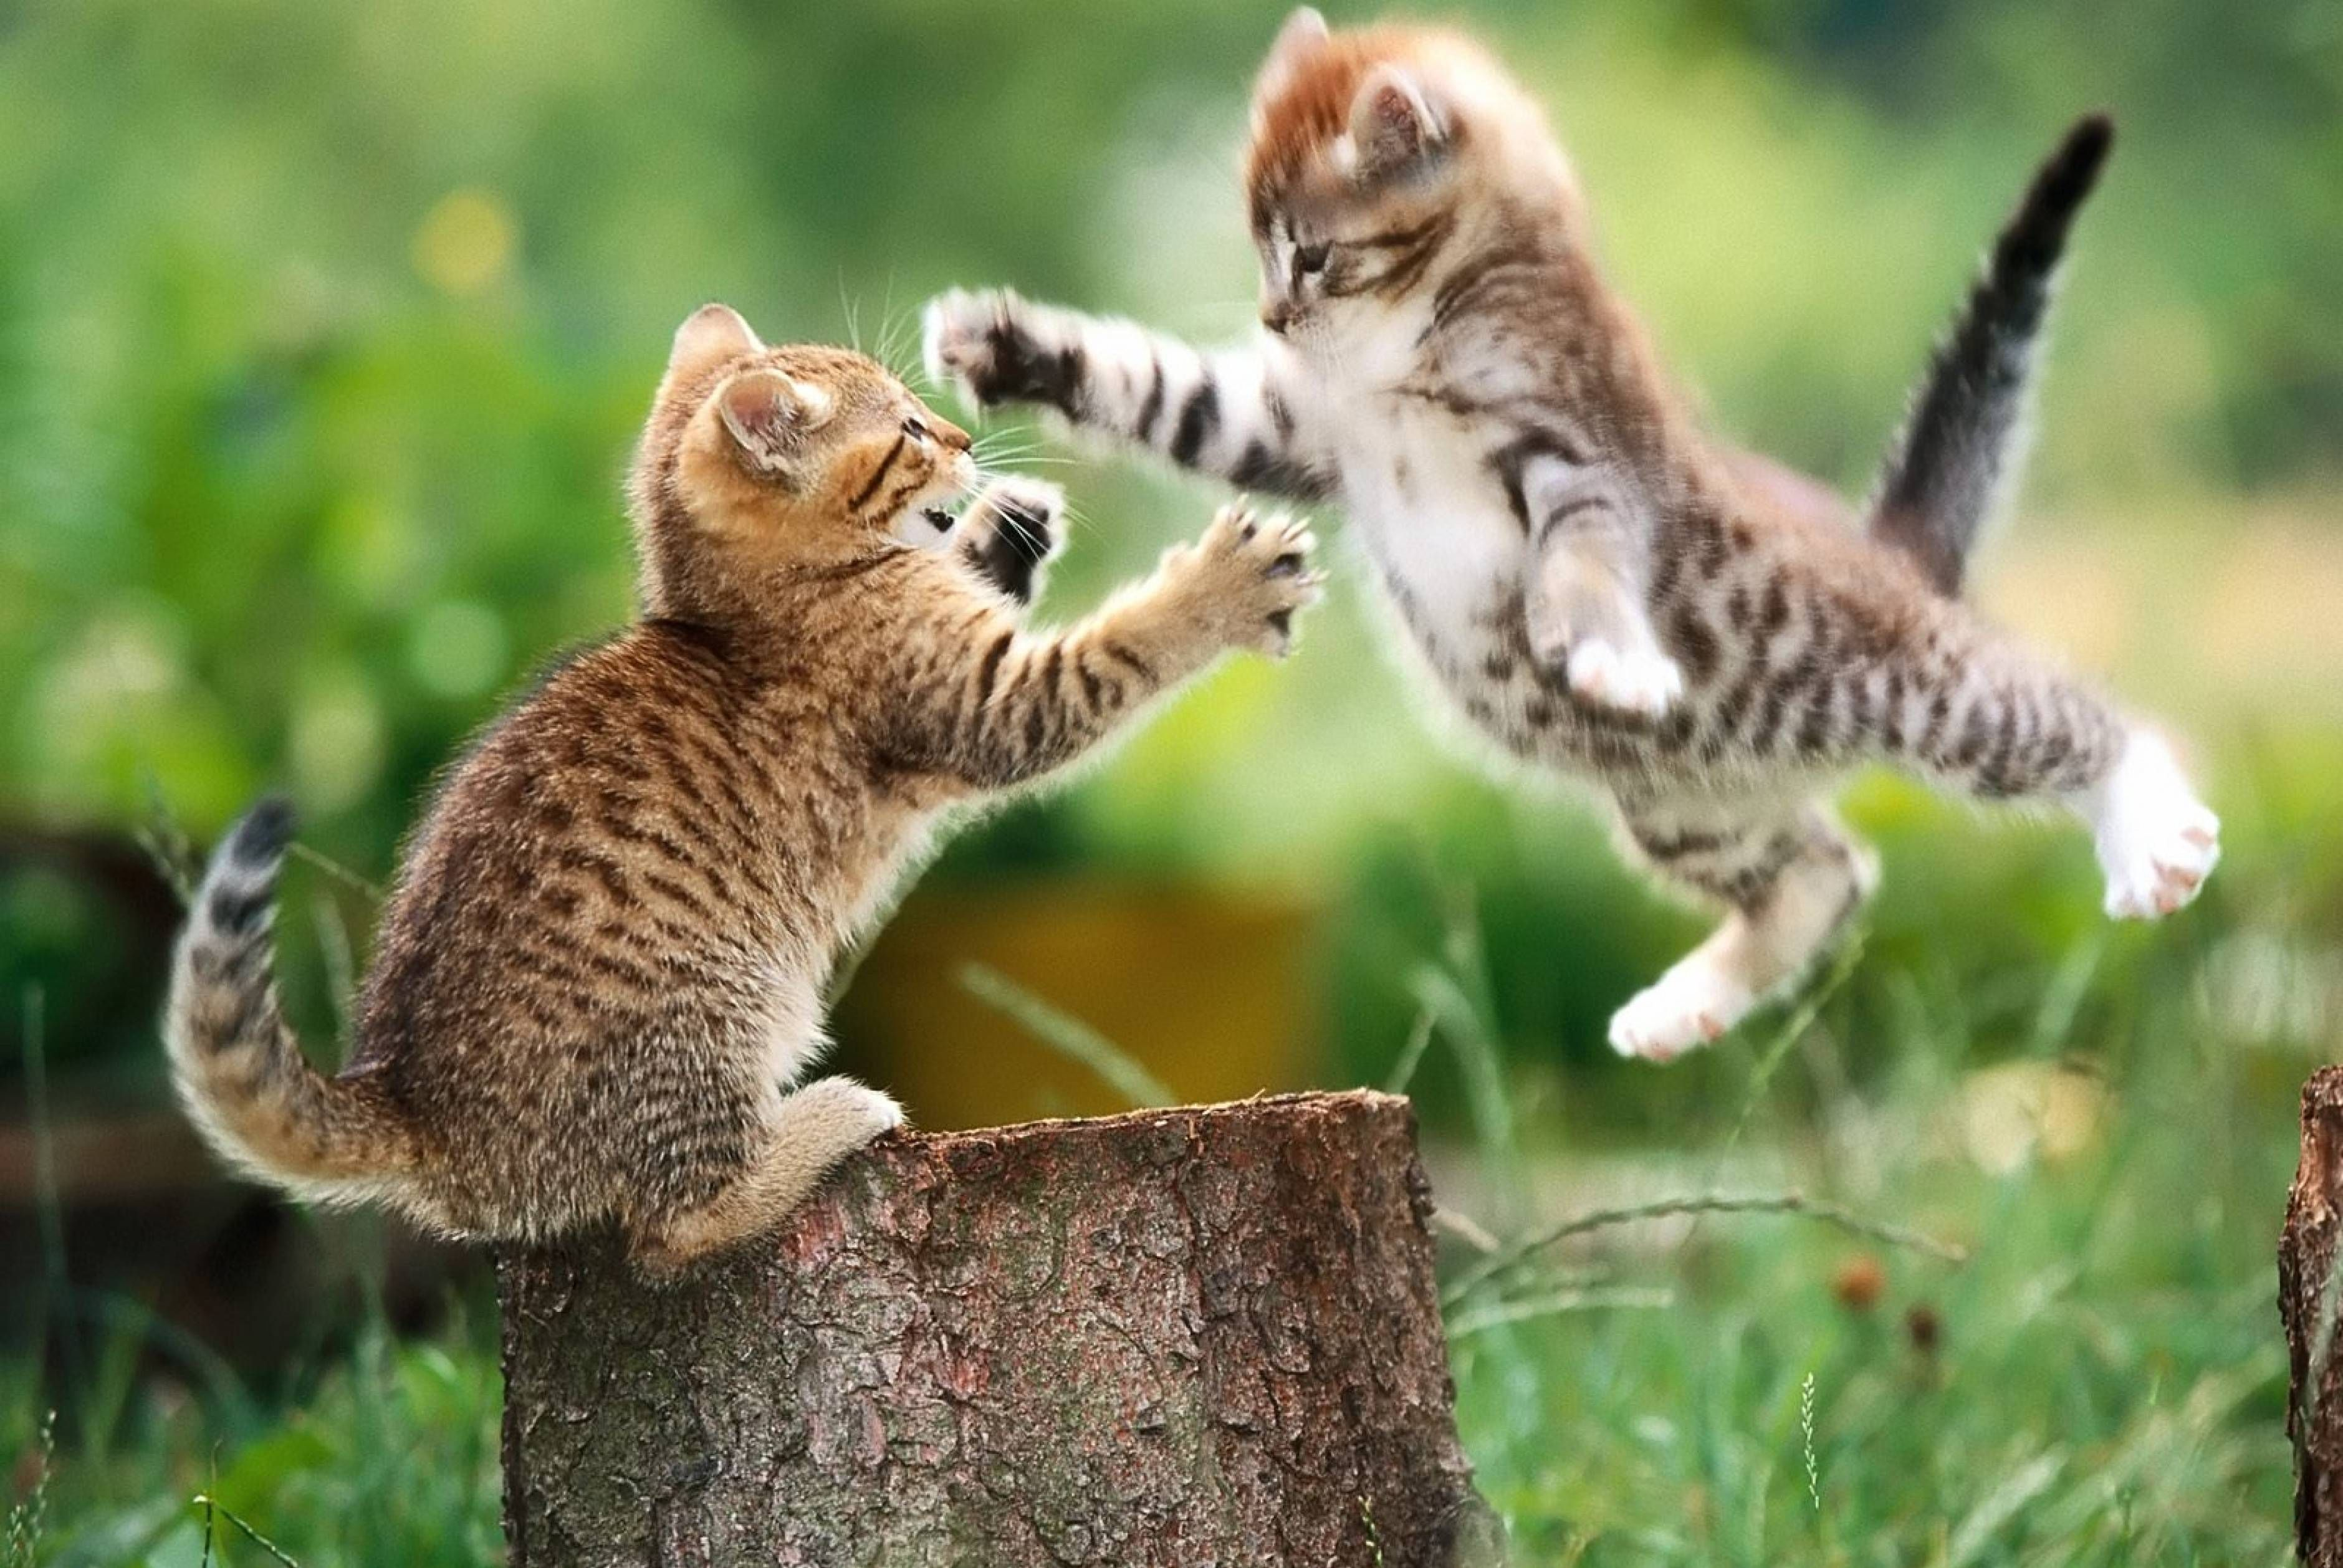 Cute Kittens Catsandkittensbreeds Kittens Cutest Funny Cat Wallpaper Kitten Wallpaper